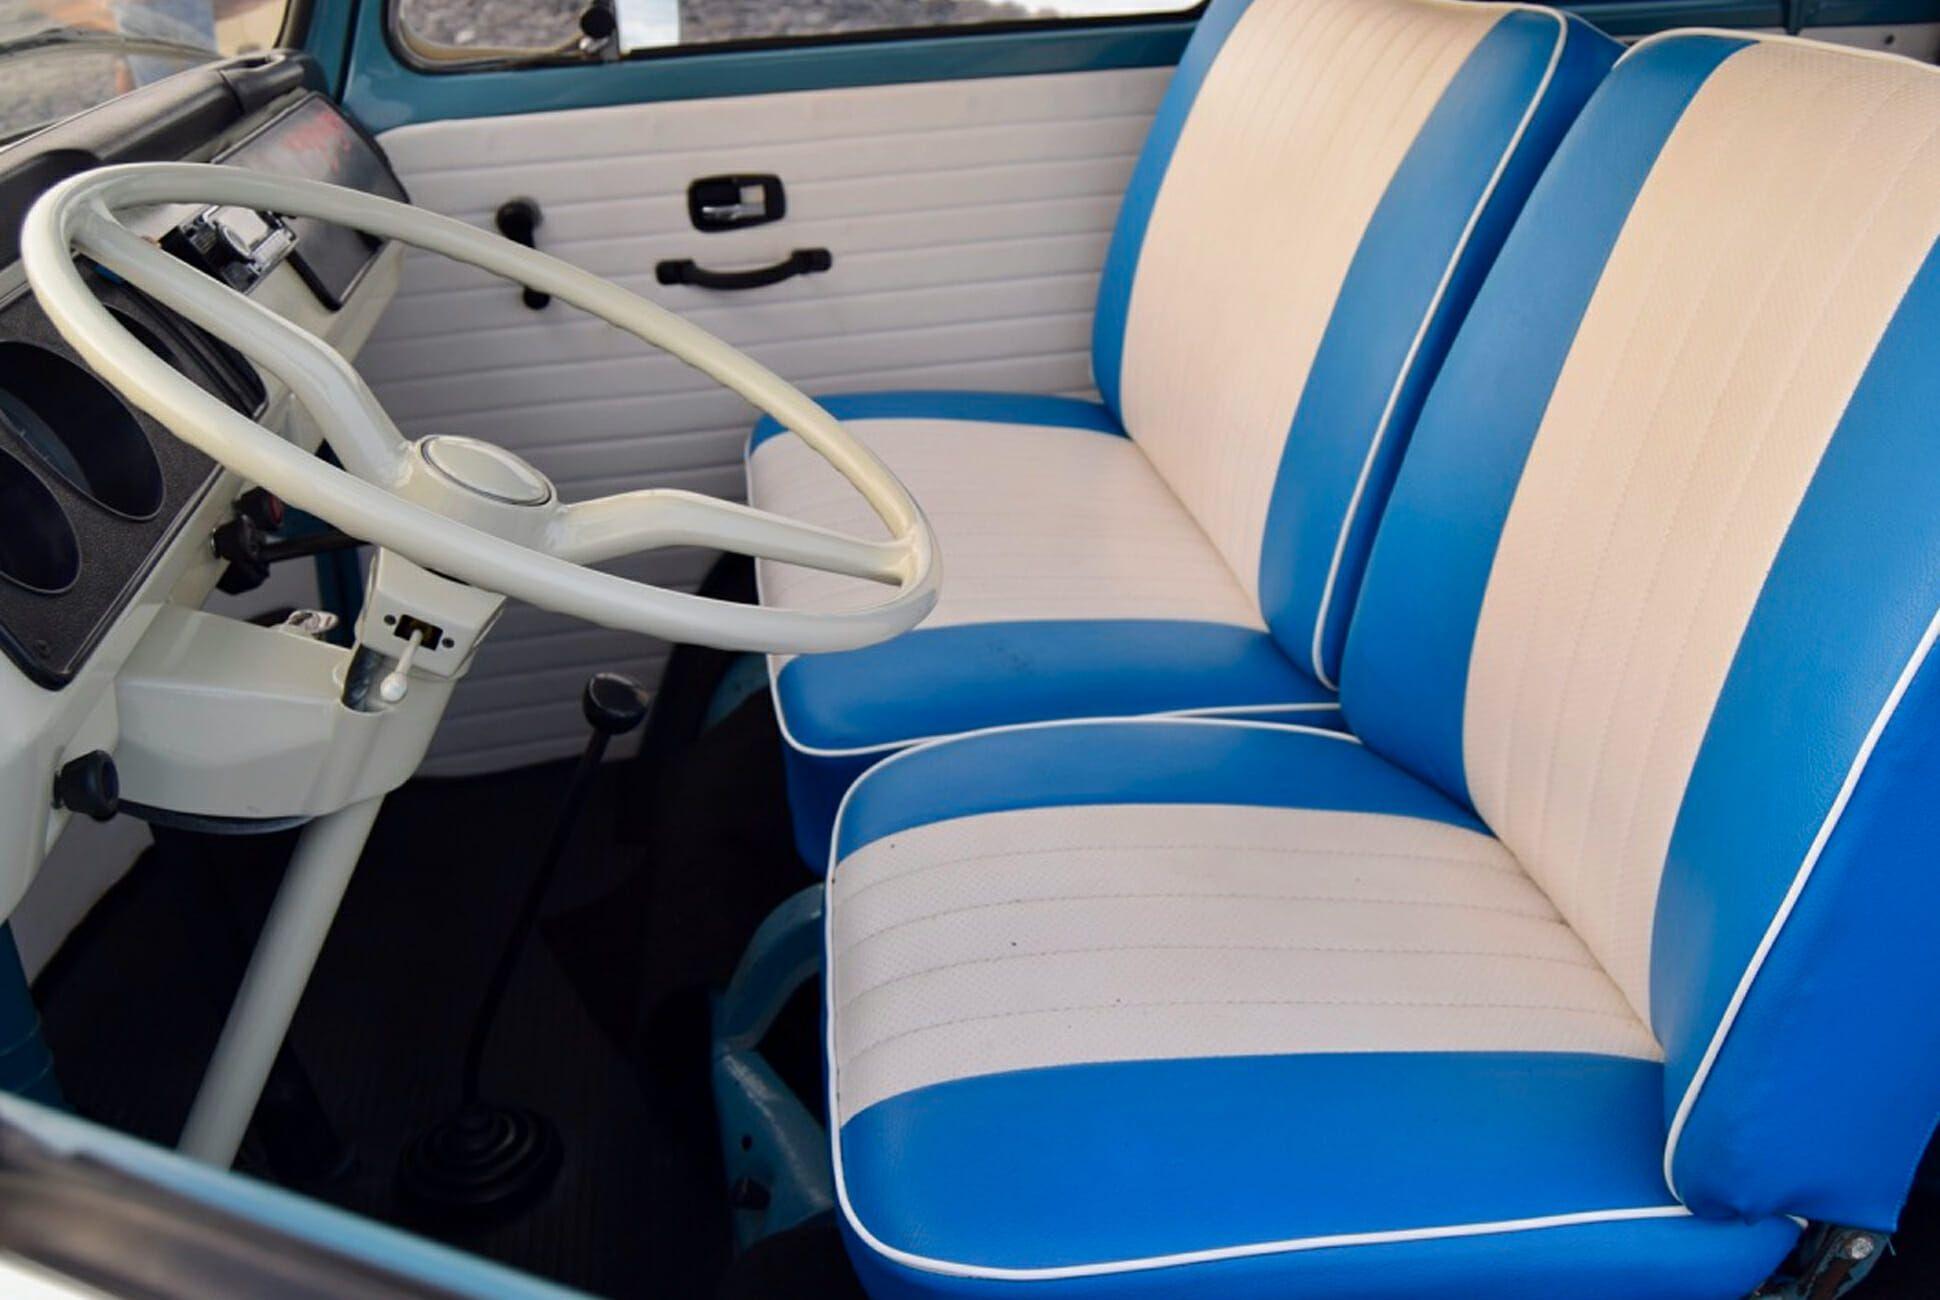 1971-Volkswagen-T2-Doka-Transporter-gear-patrol-slide-04